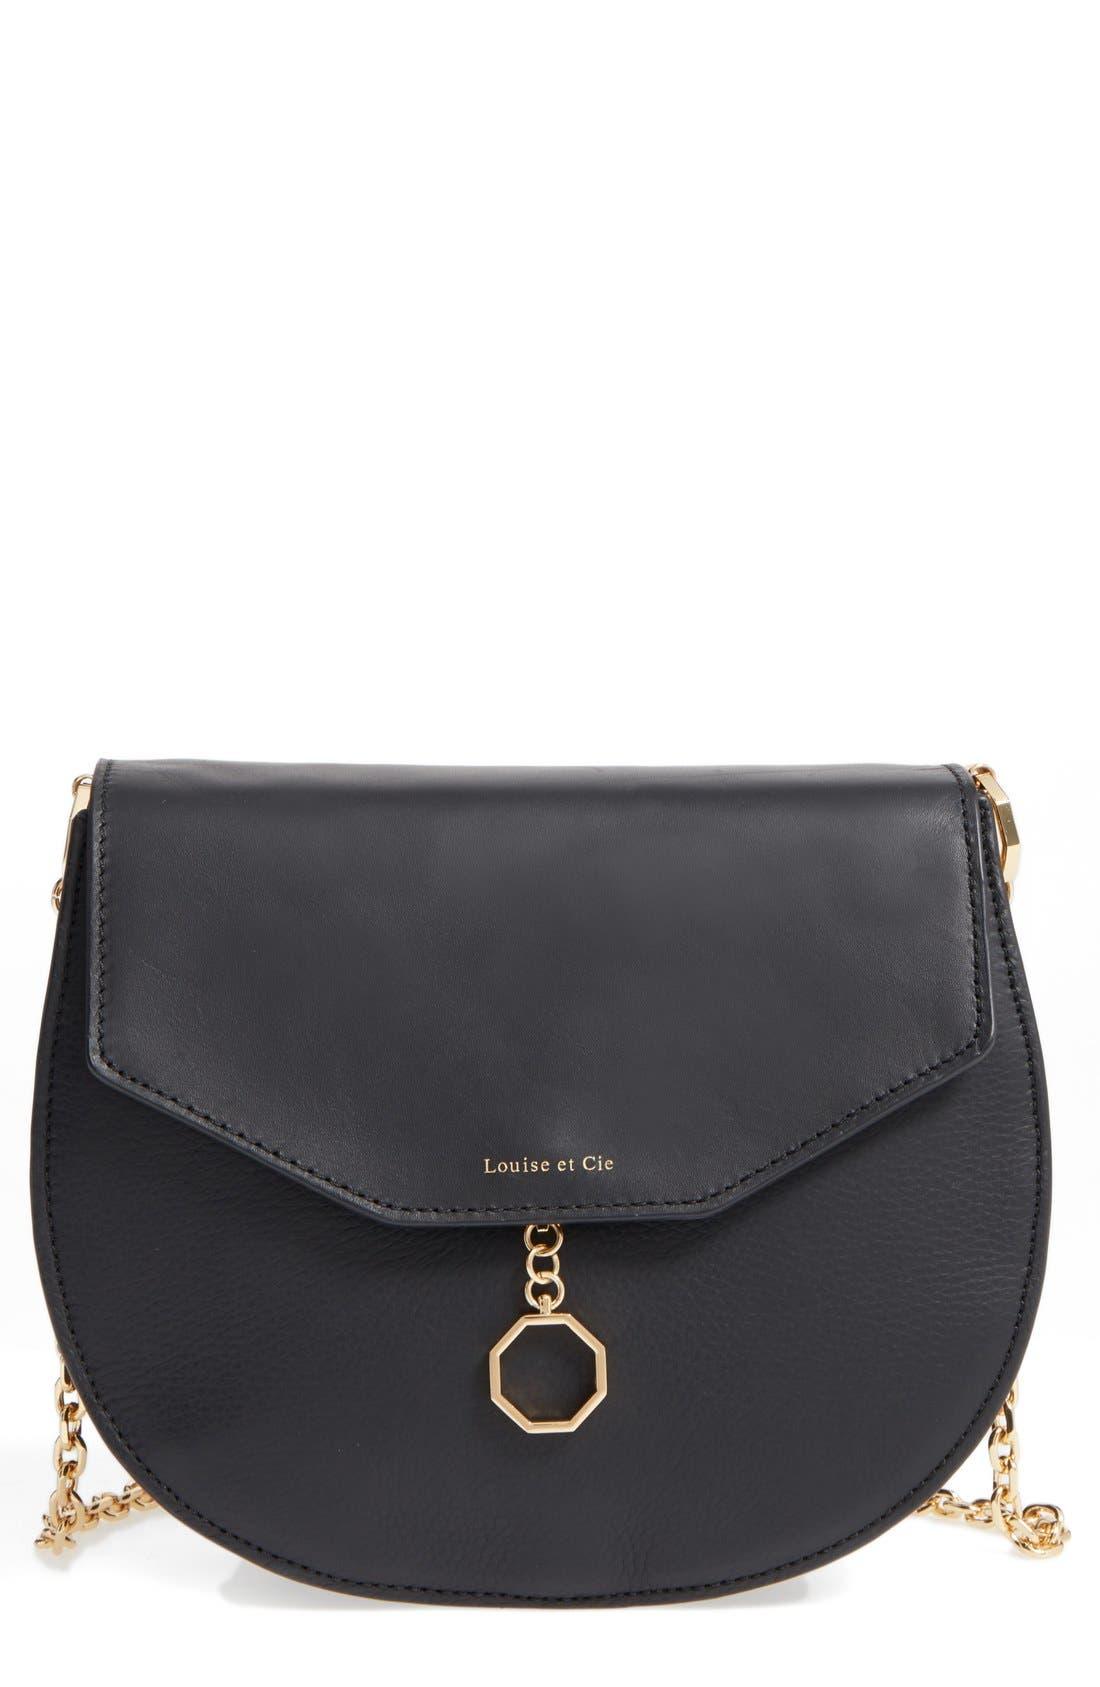 Main Image - Louise et Cie Jael Leather Crossbody Bag